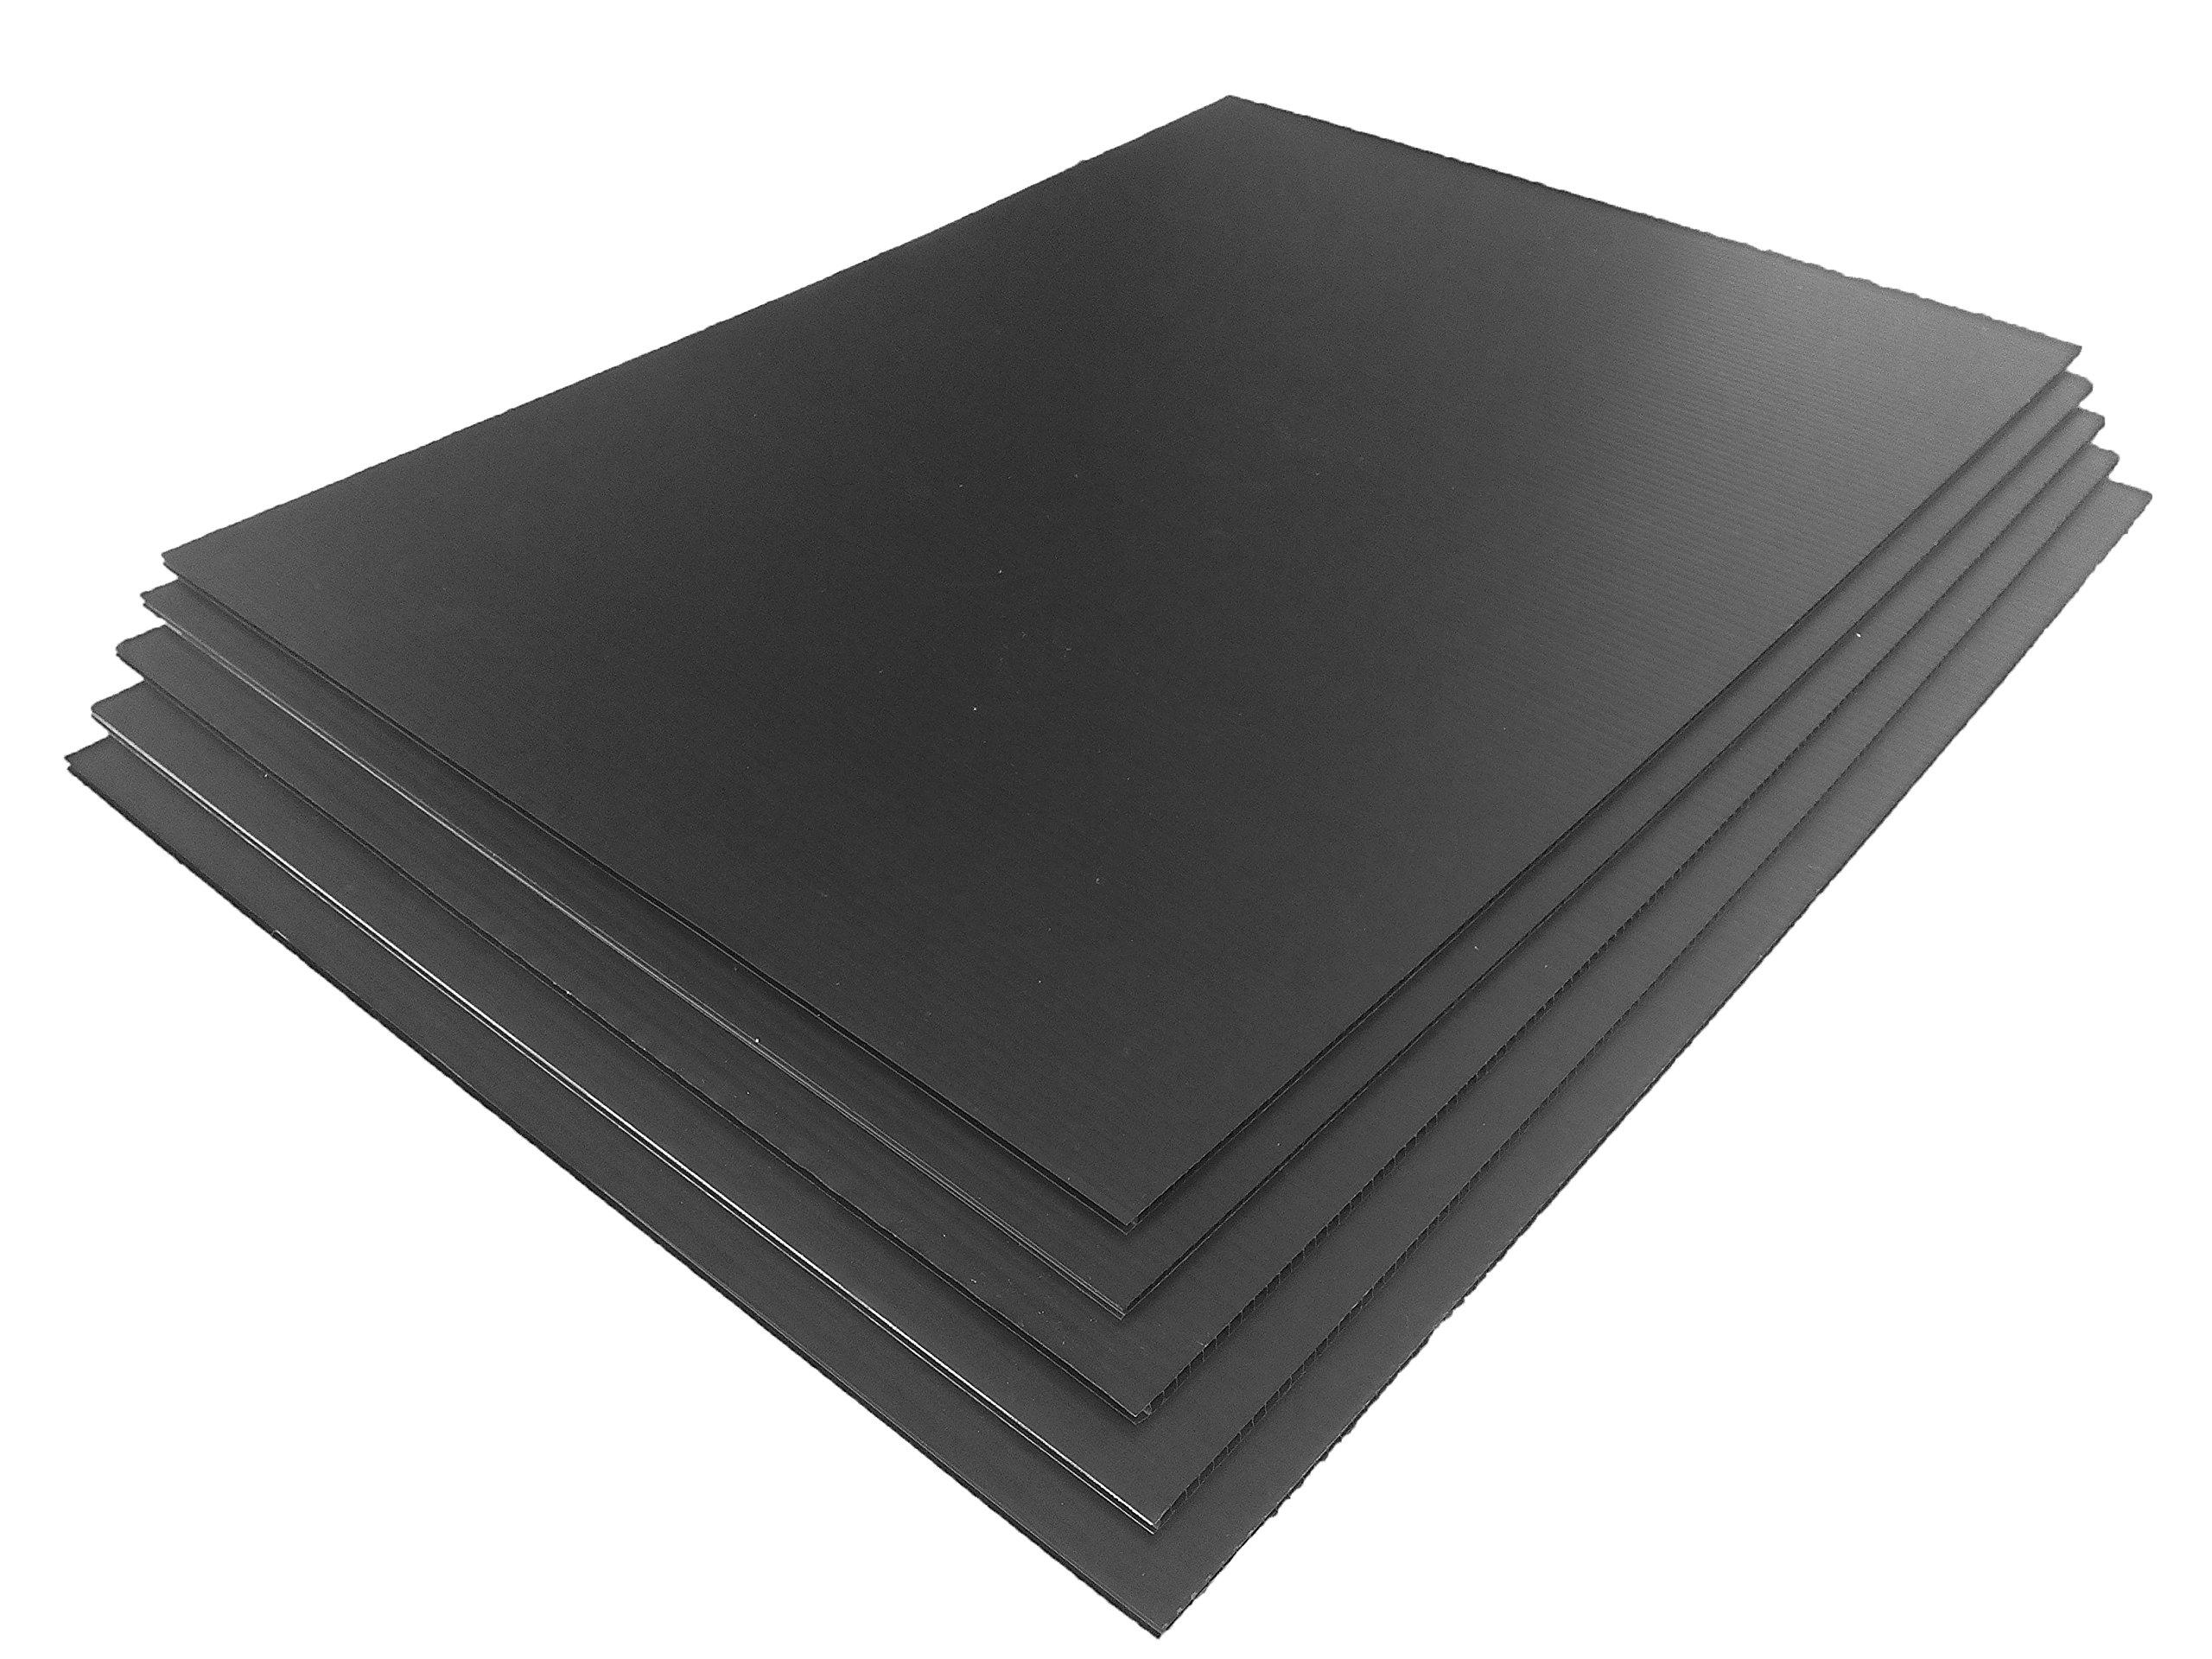 TSM Coroplast Correx Poster Corrugated Plastics Sheets Sign Blank Board (24''x18''x4mm., 5-pack/blacks) by TSM